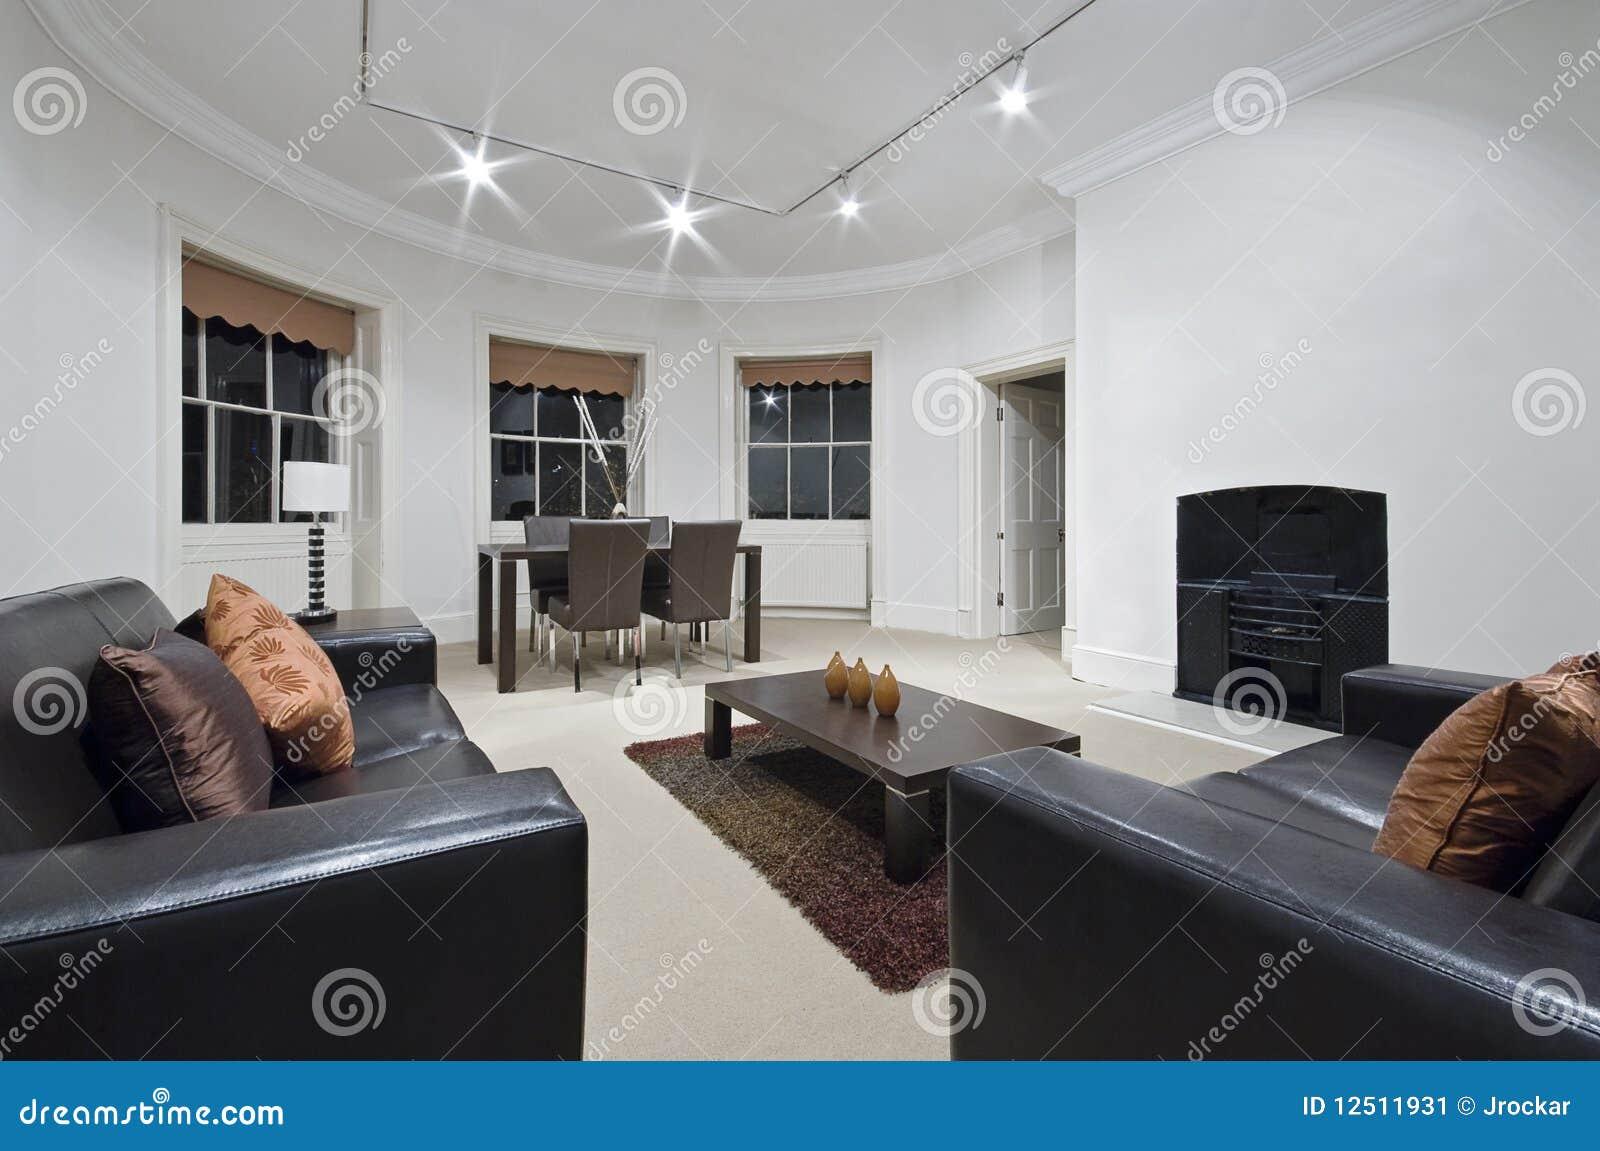 amazing living room stock image image 12511931. Black Bedroom Furniture Sets. Home Design Ideas